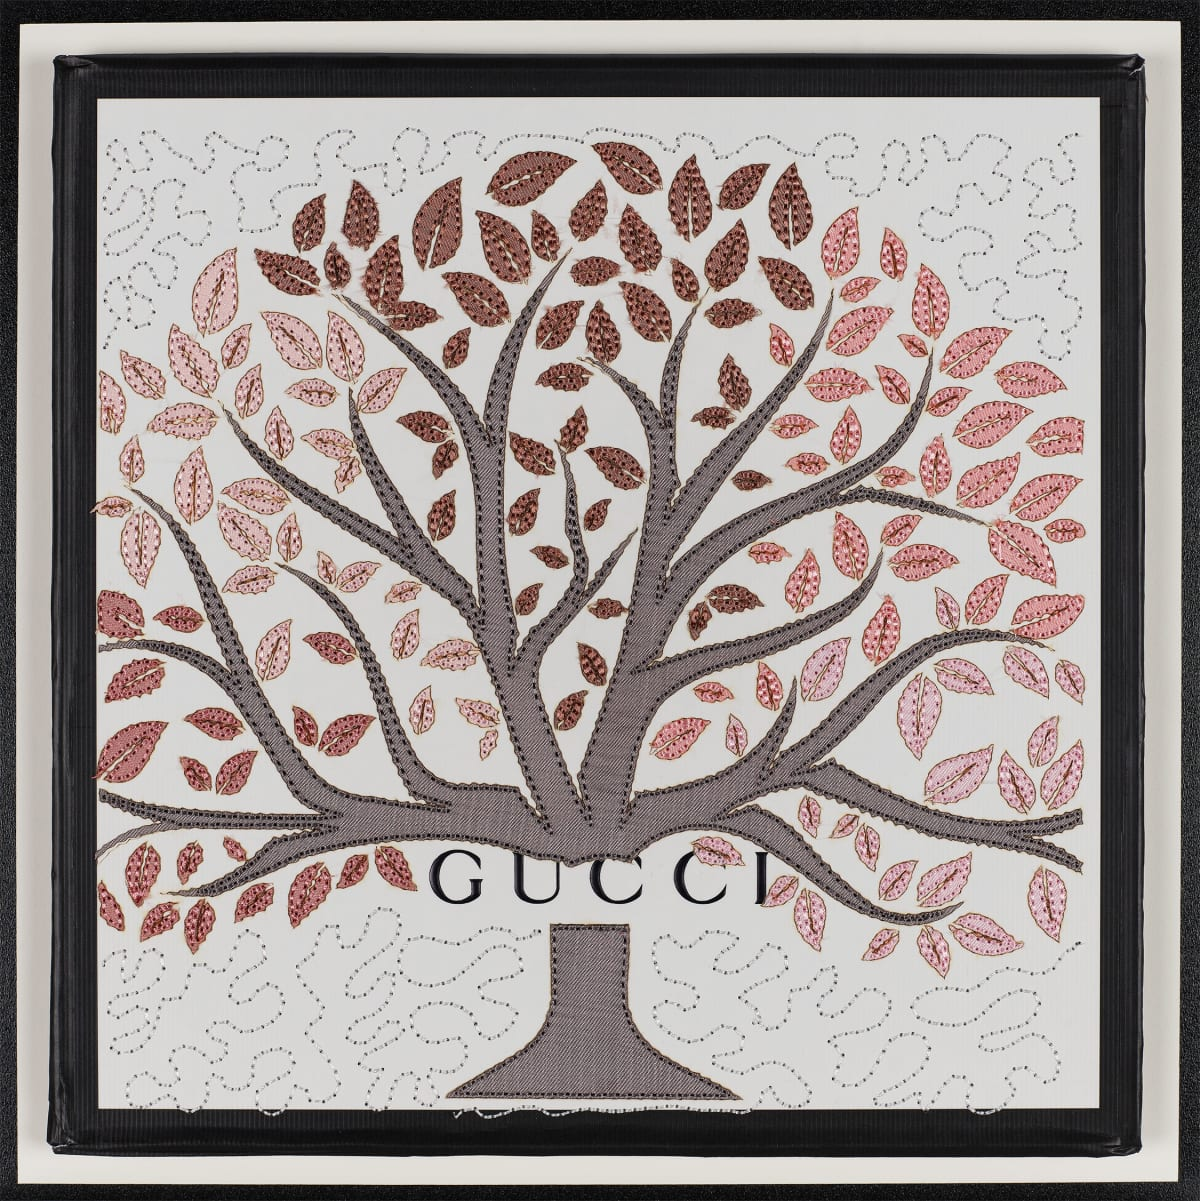 Stephen Wilson, Gucci Tree (Grey), 2019